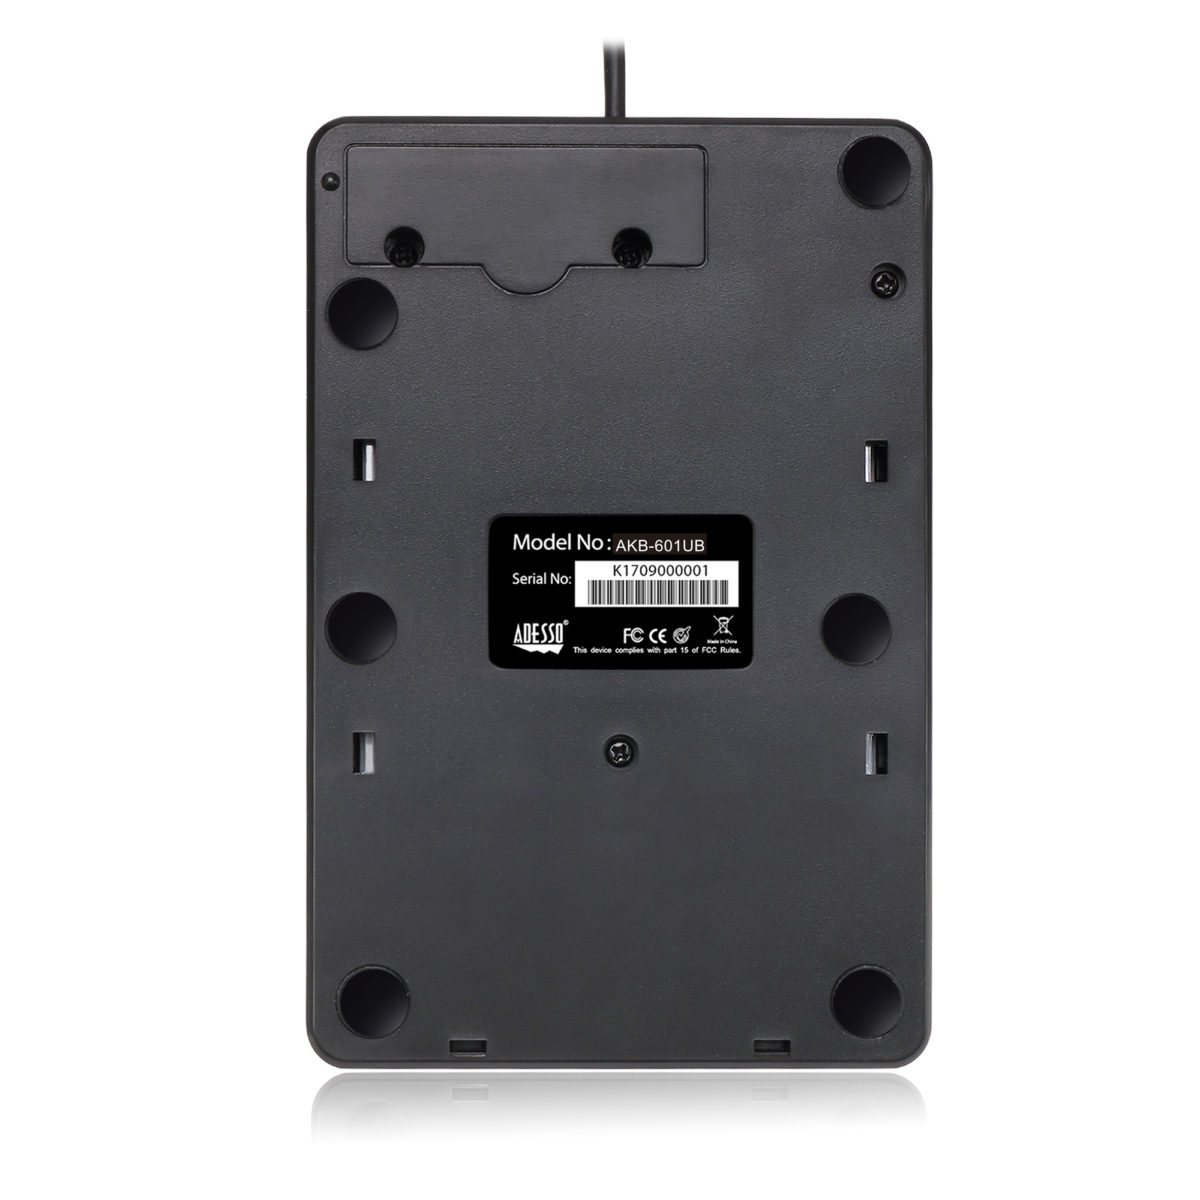 USB Numeriek toetsenbord met 18 toetsen